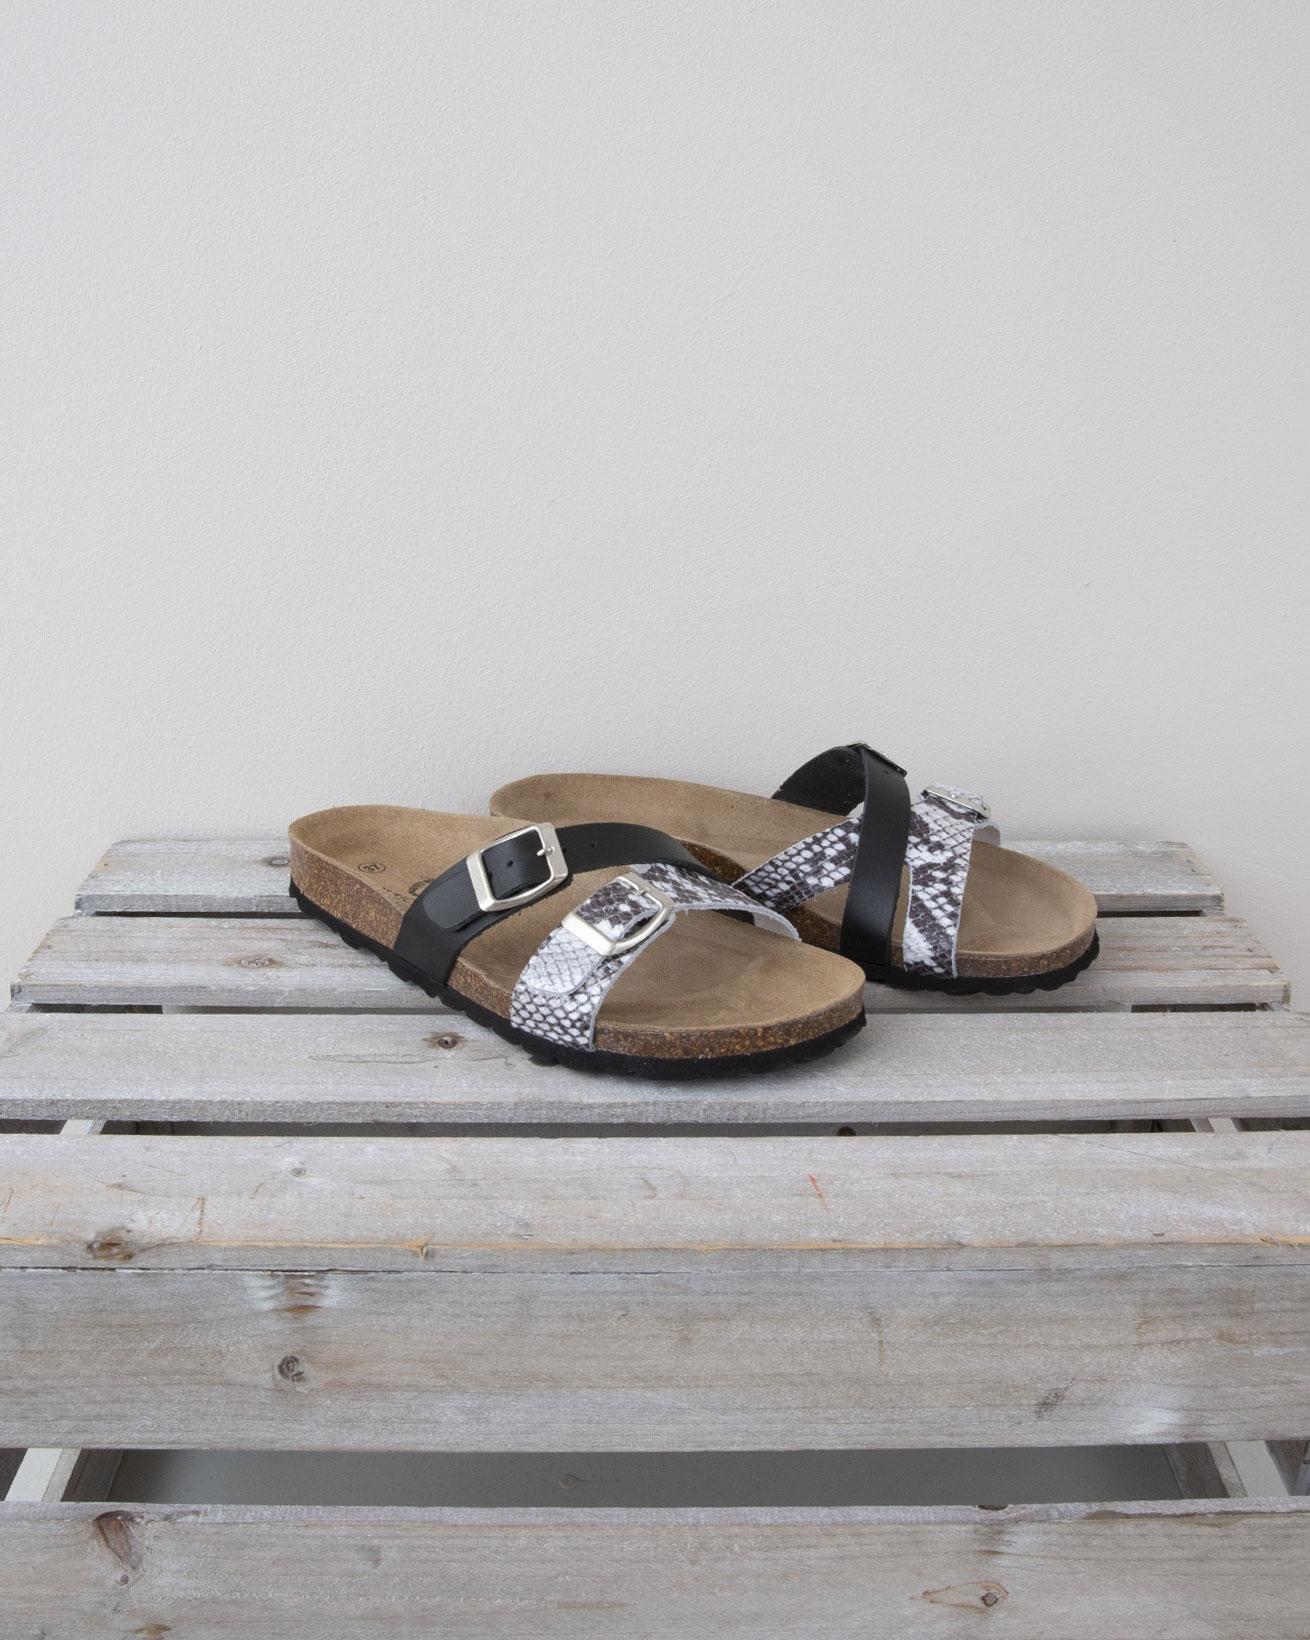 Crossover Double Strap Sandal - Size 37 - Black & Snake - 1327